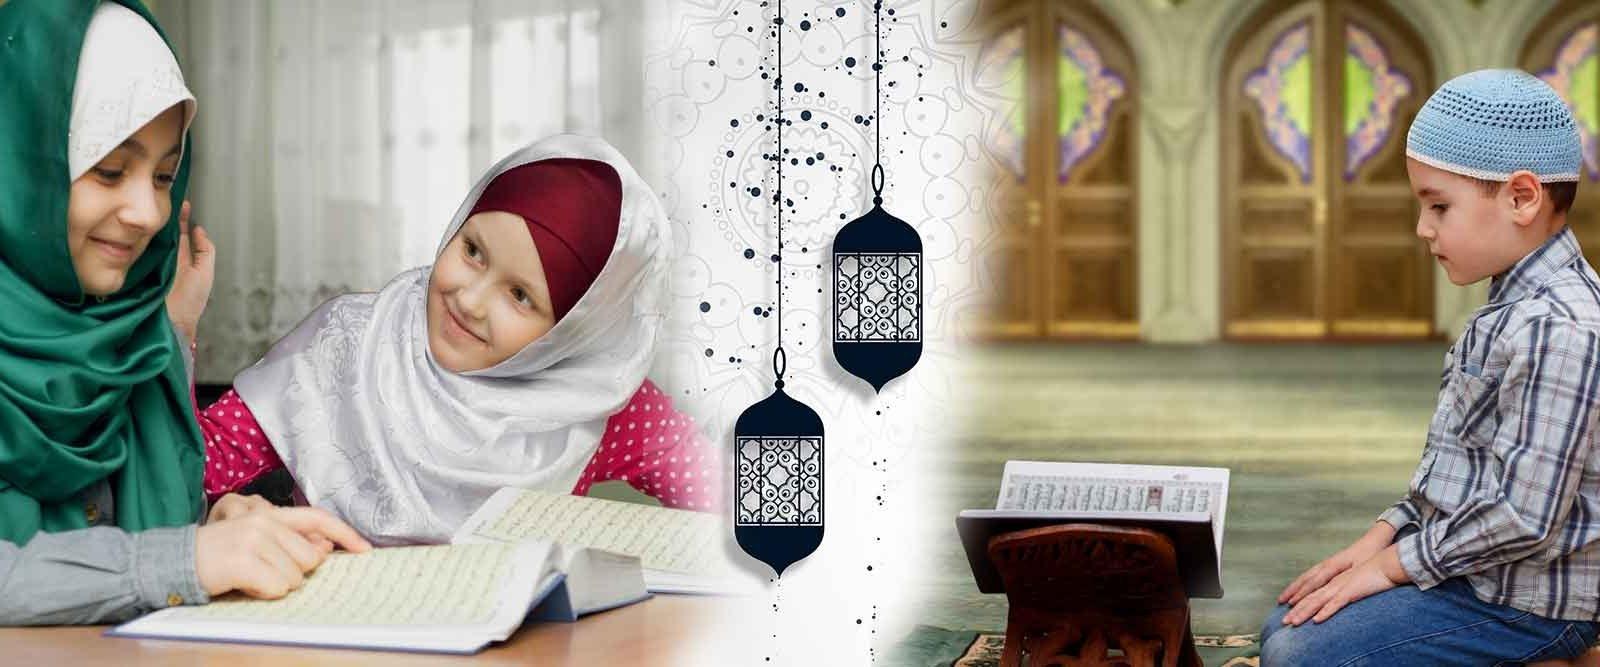 QURANFORKIDS (@quranforkids123) Cover Image